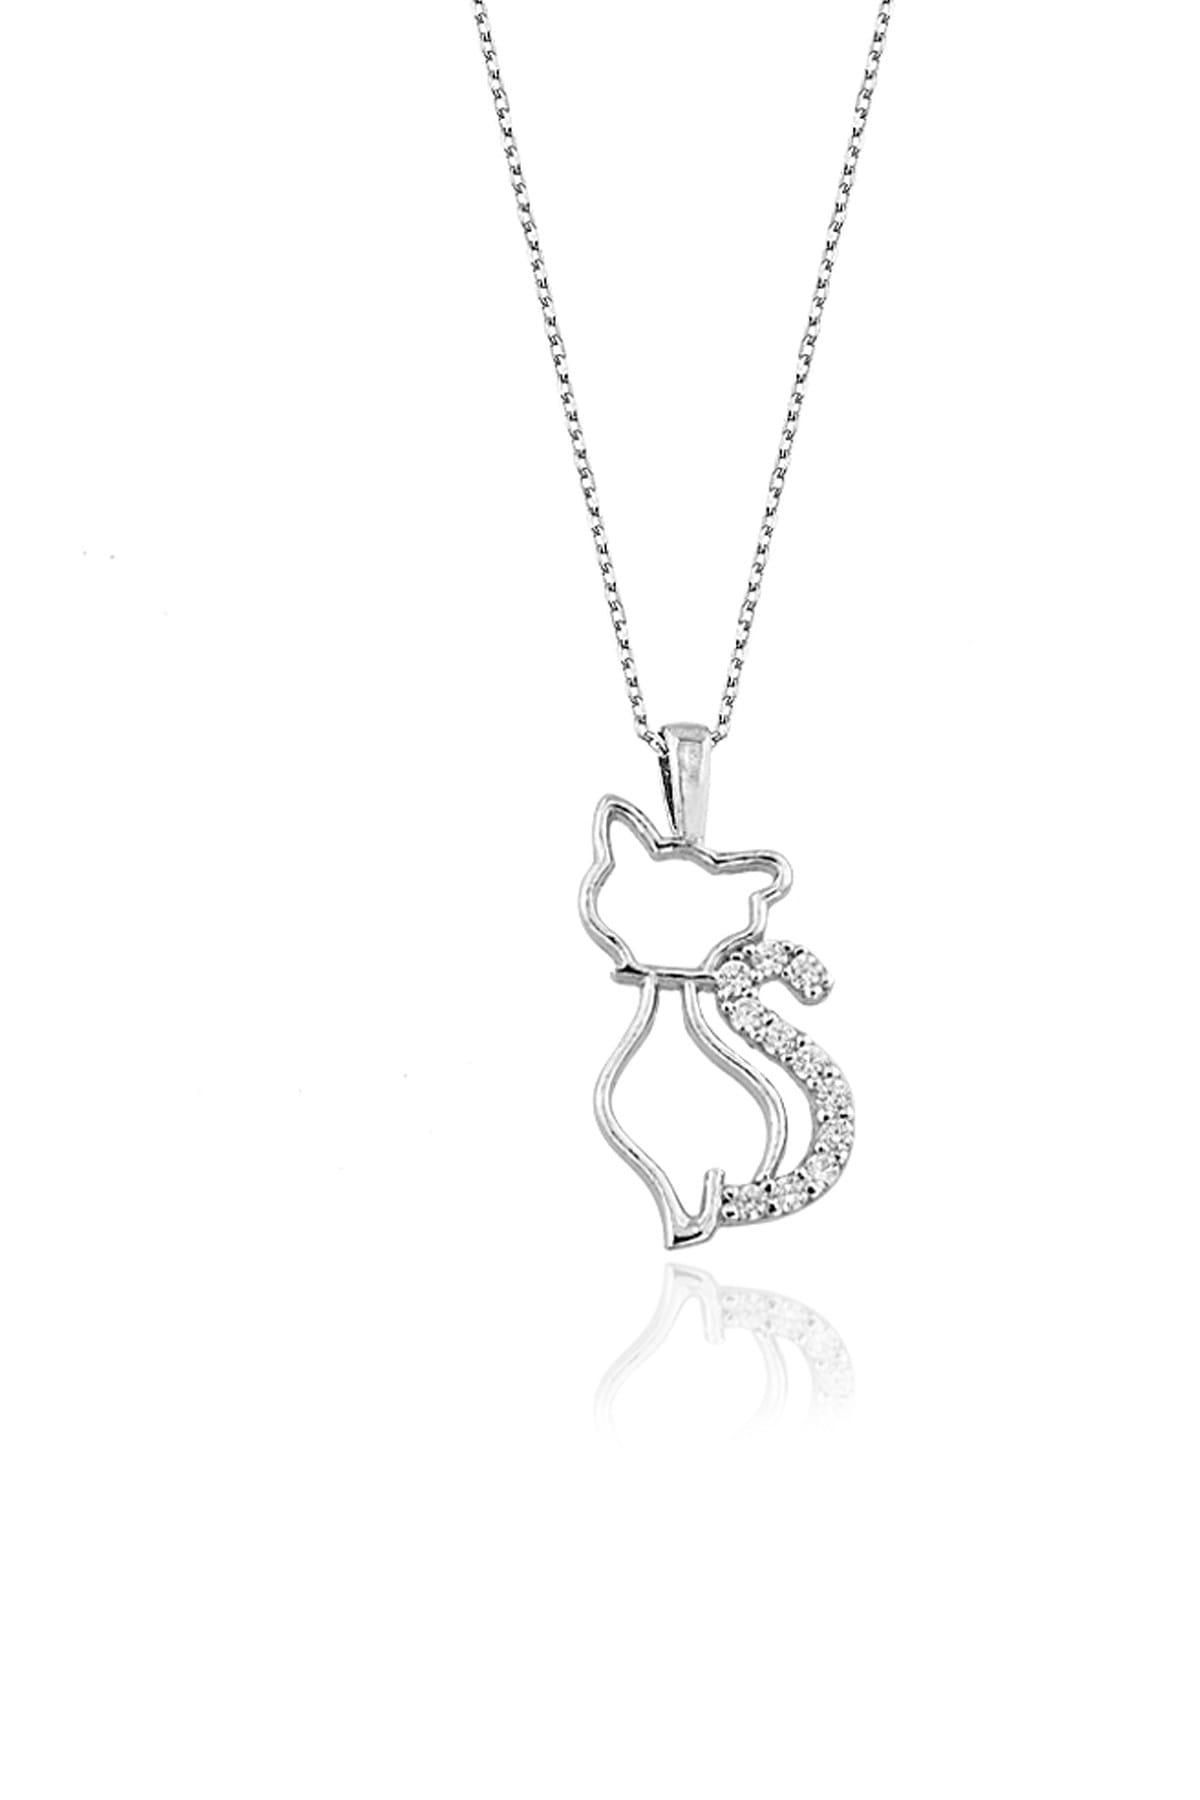 Else Silver Kedi Gümüş Kolye 1